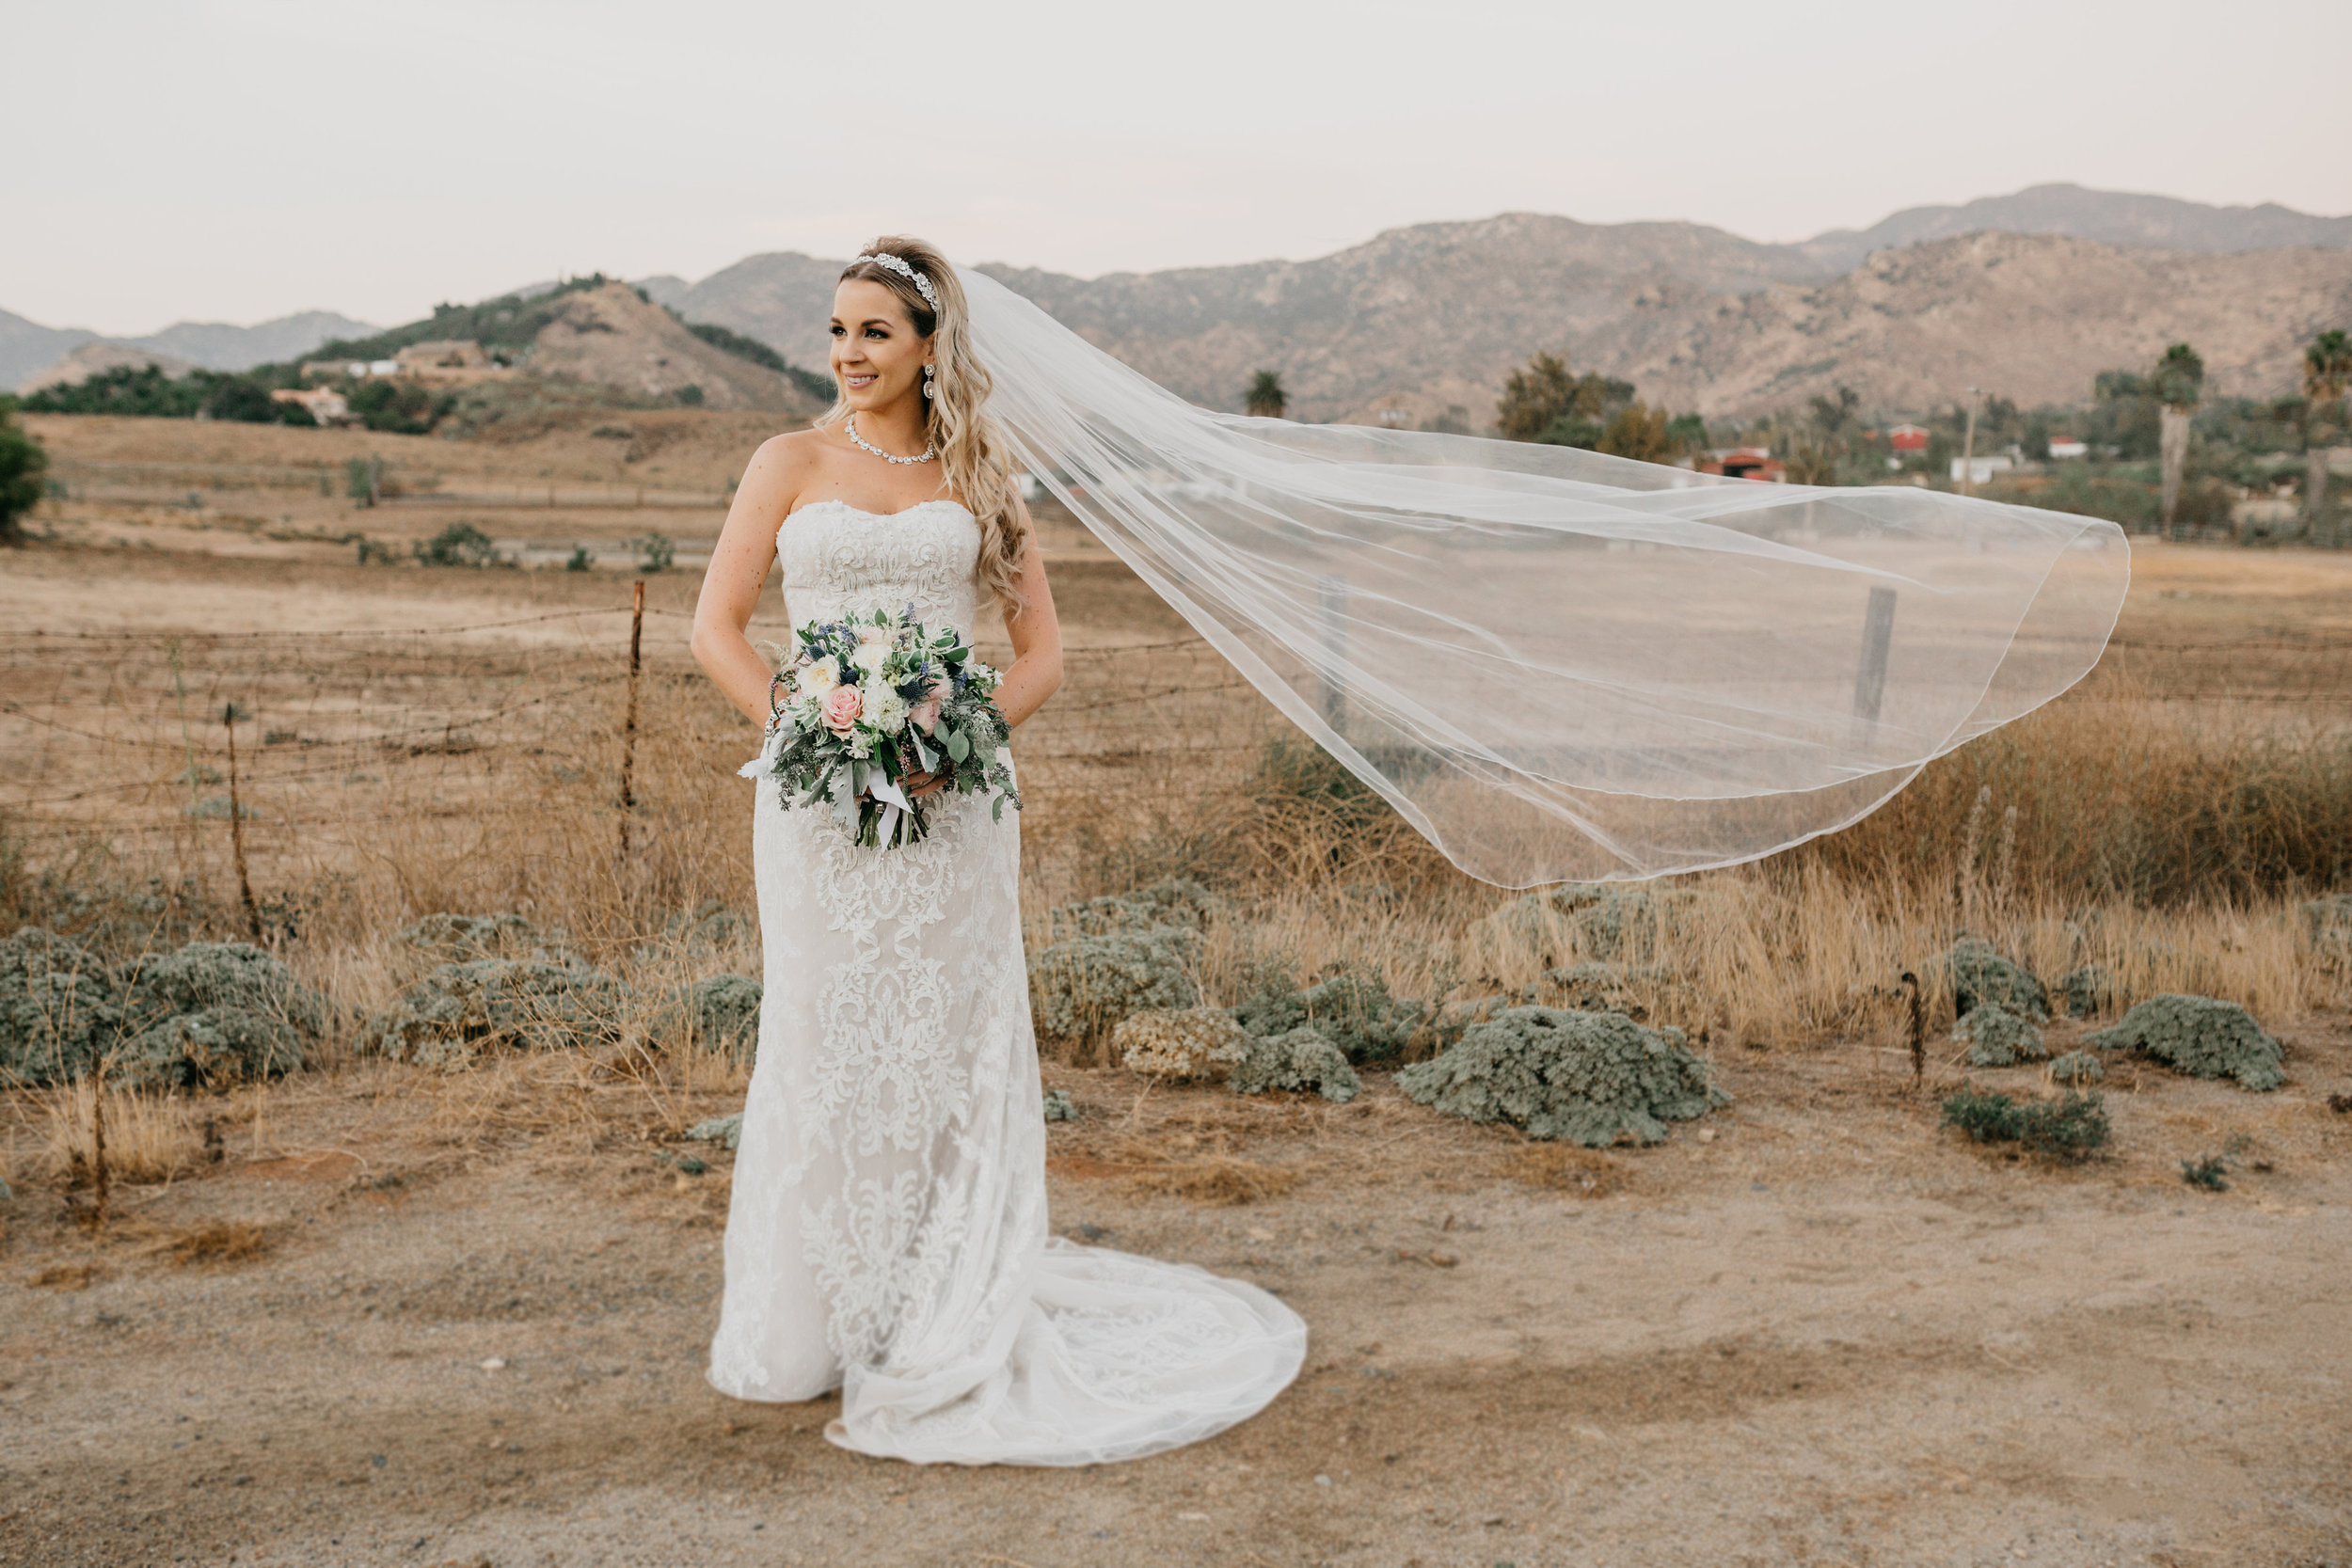 DianaLakePhoto-L+M-San-Diego-Wedding-Mr&Mrs135.jpg